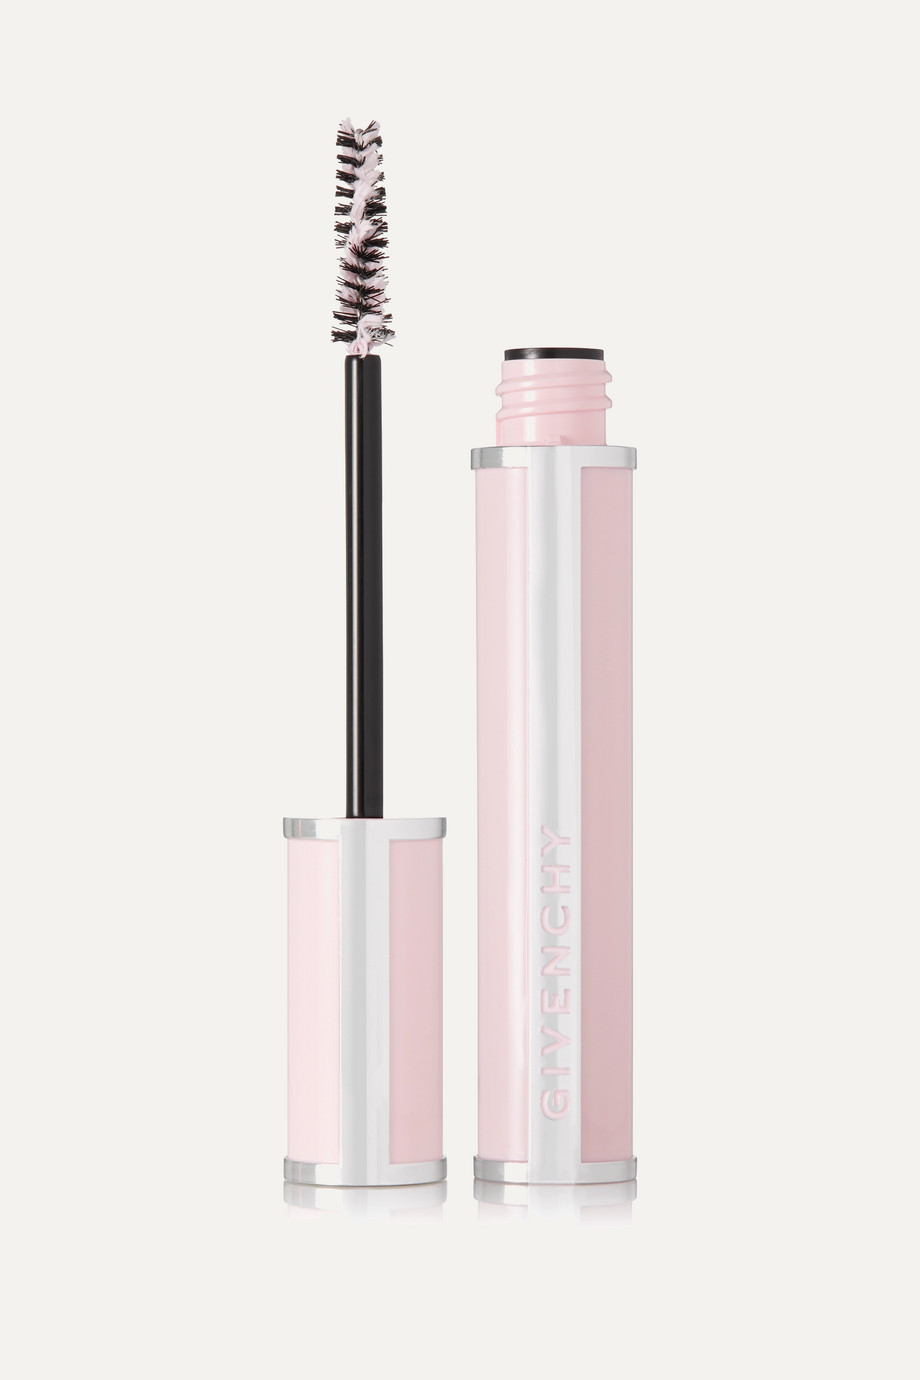 Givenchy Beauty Base Mascara Perfecto